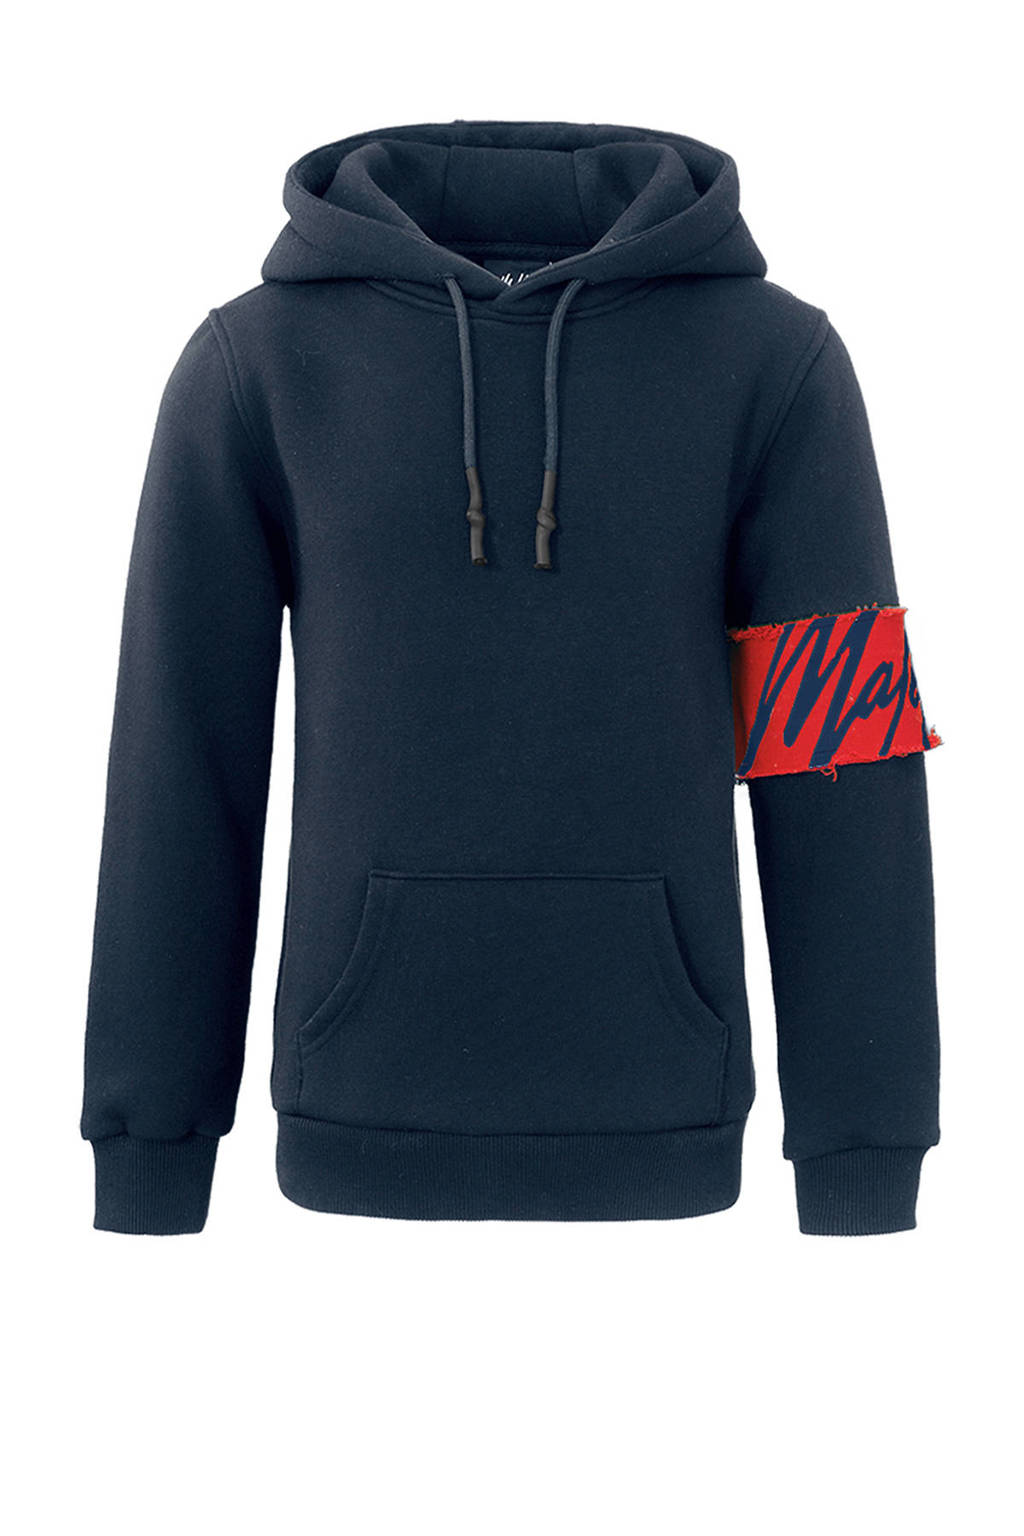 Malelions hoodie Captain met logo donkerblauw, Donkerblauw